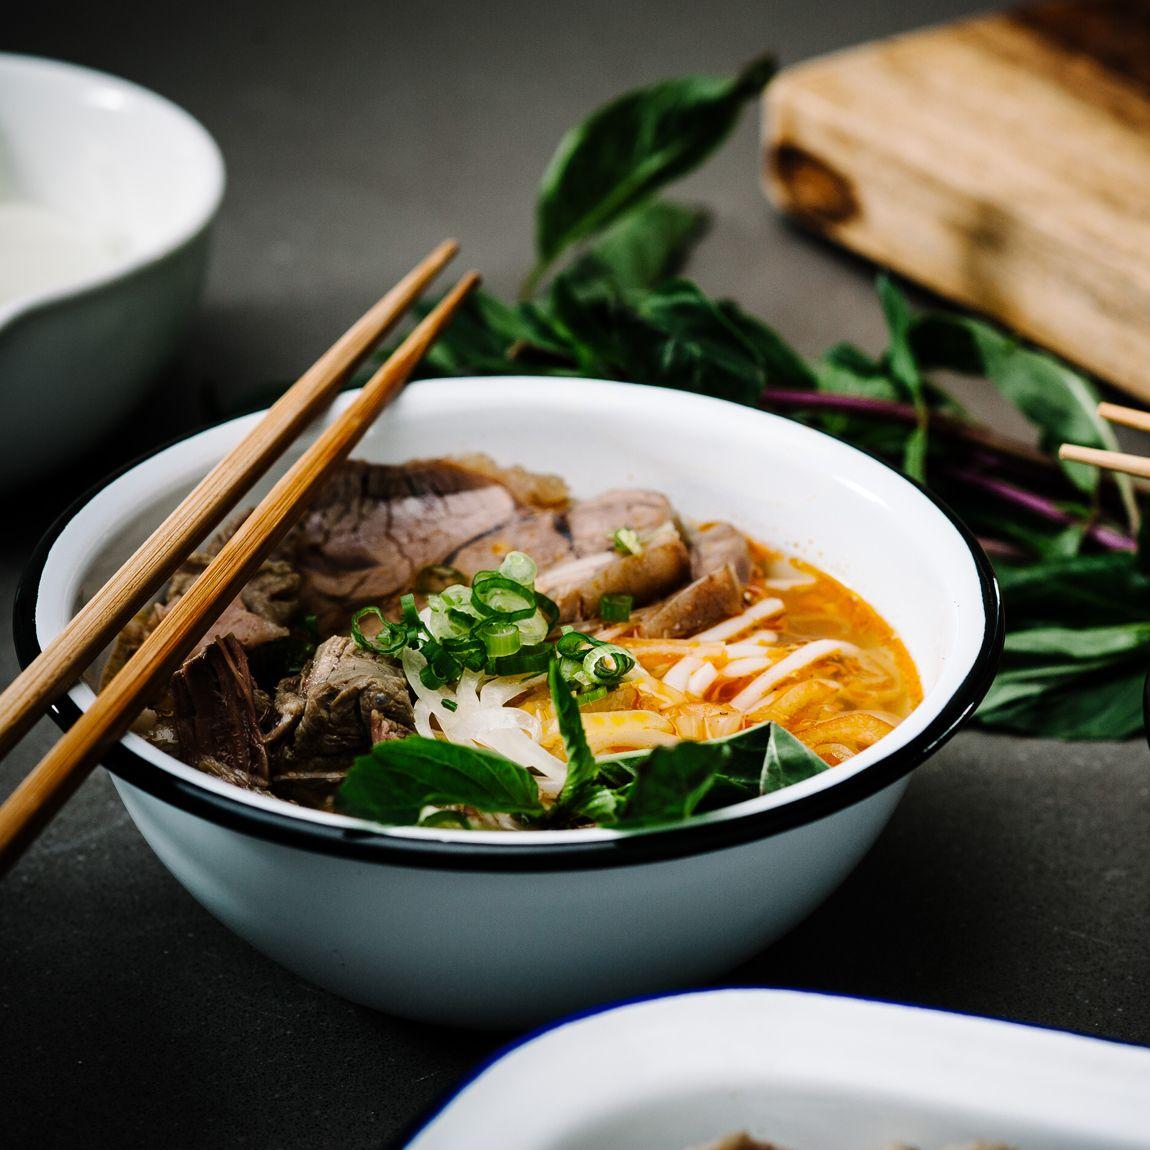 @iamafoodblog's Bun Bo Hue, A Fiery Spicy Red Hued